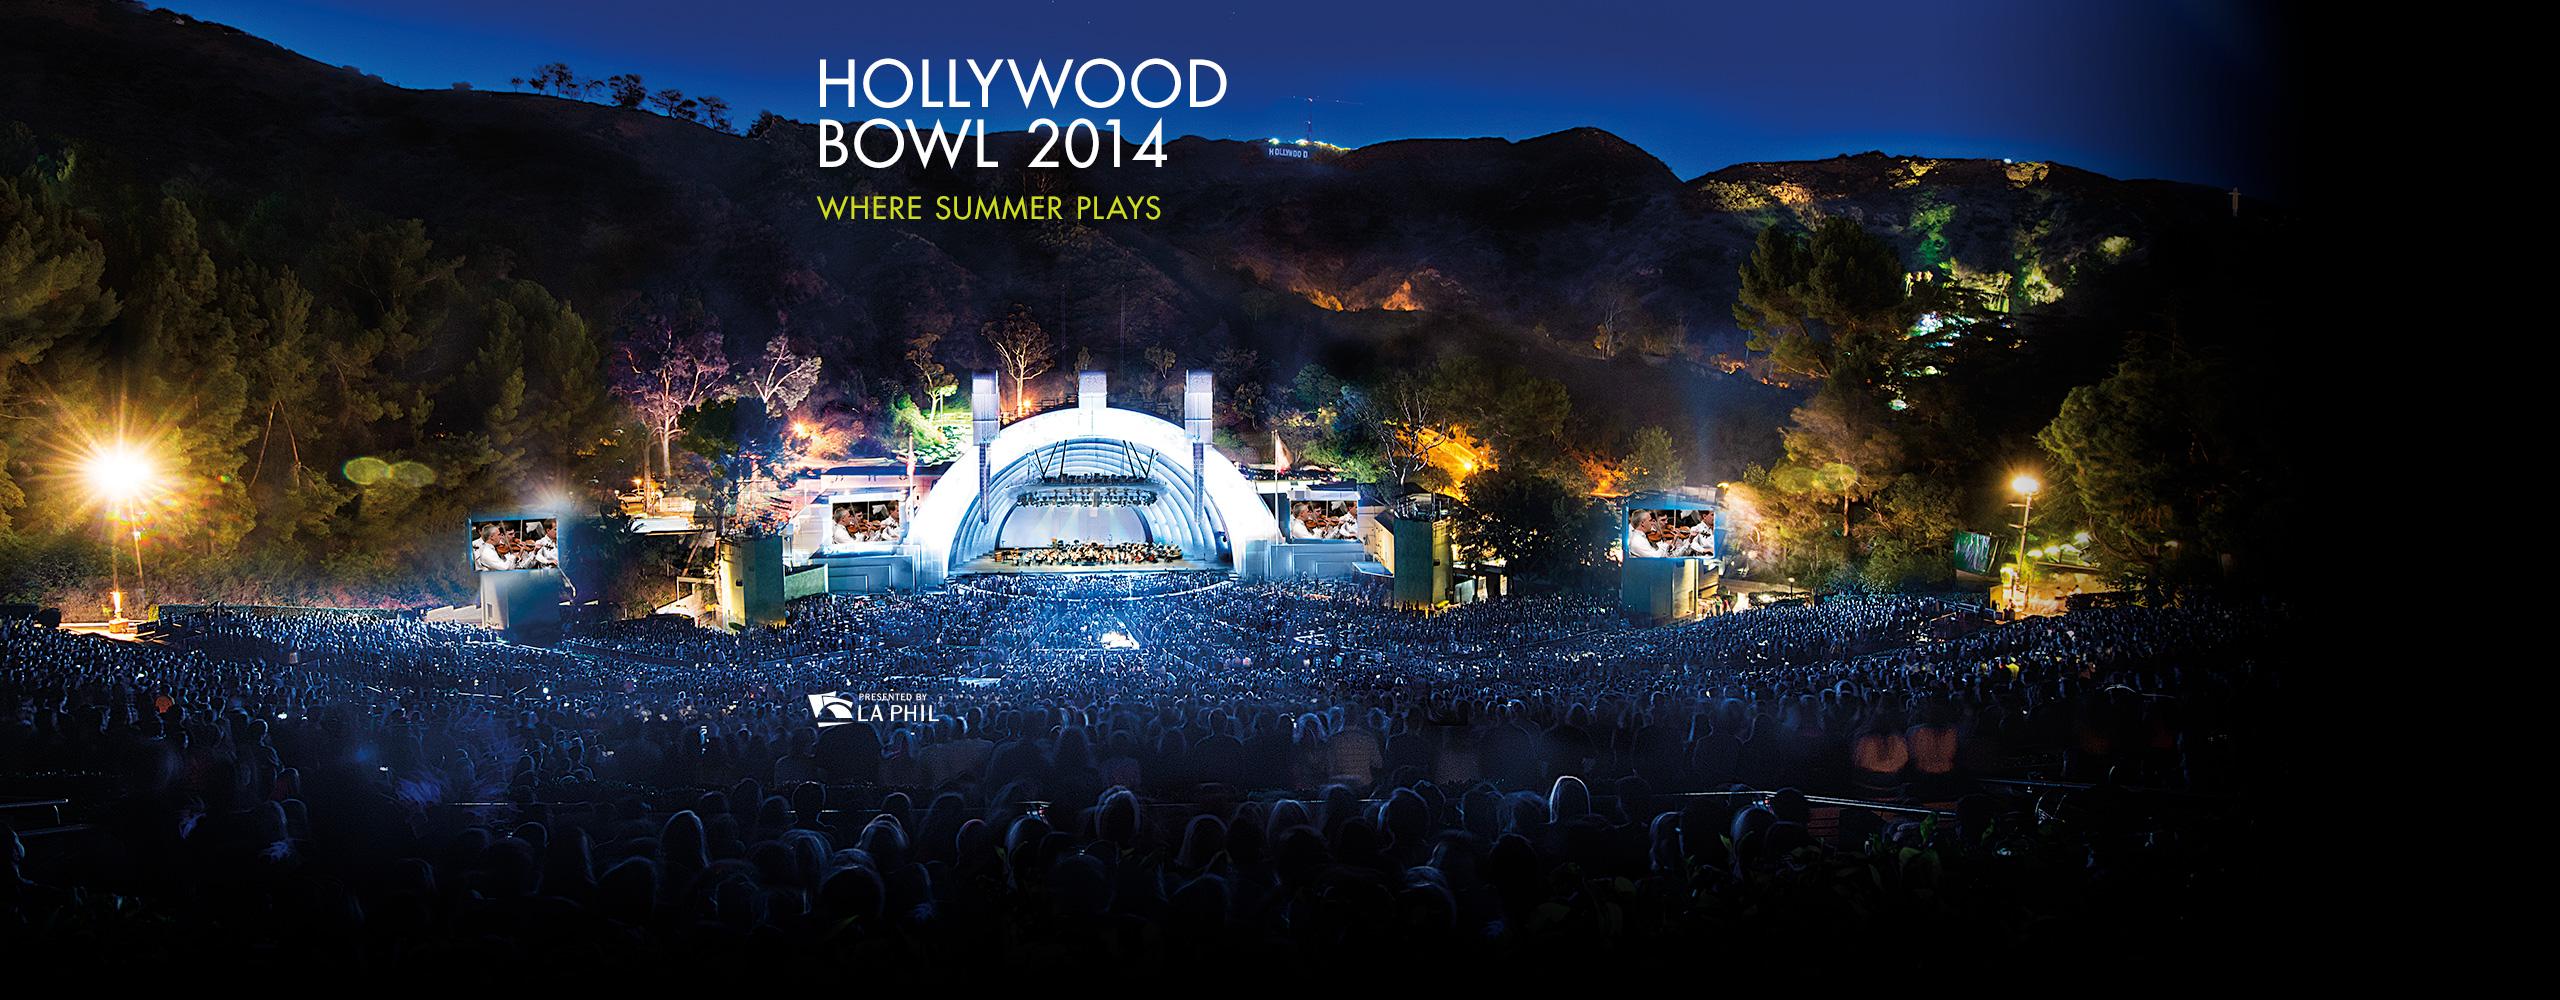 HollywoodBowl2014